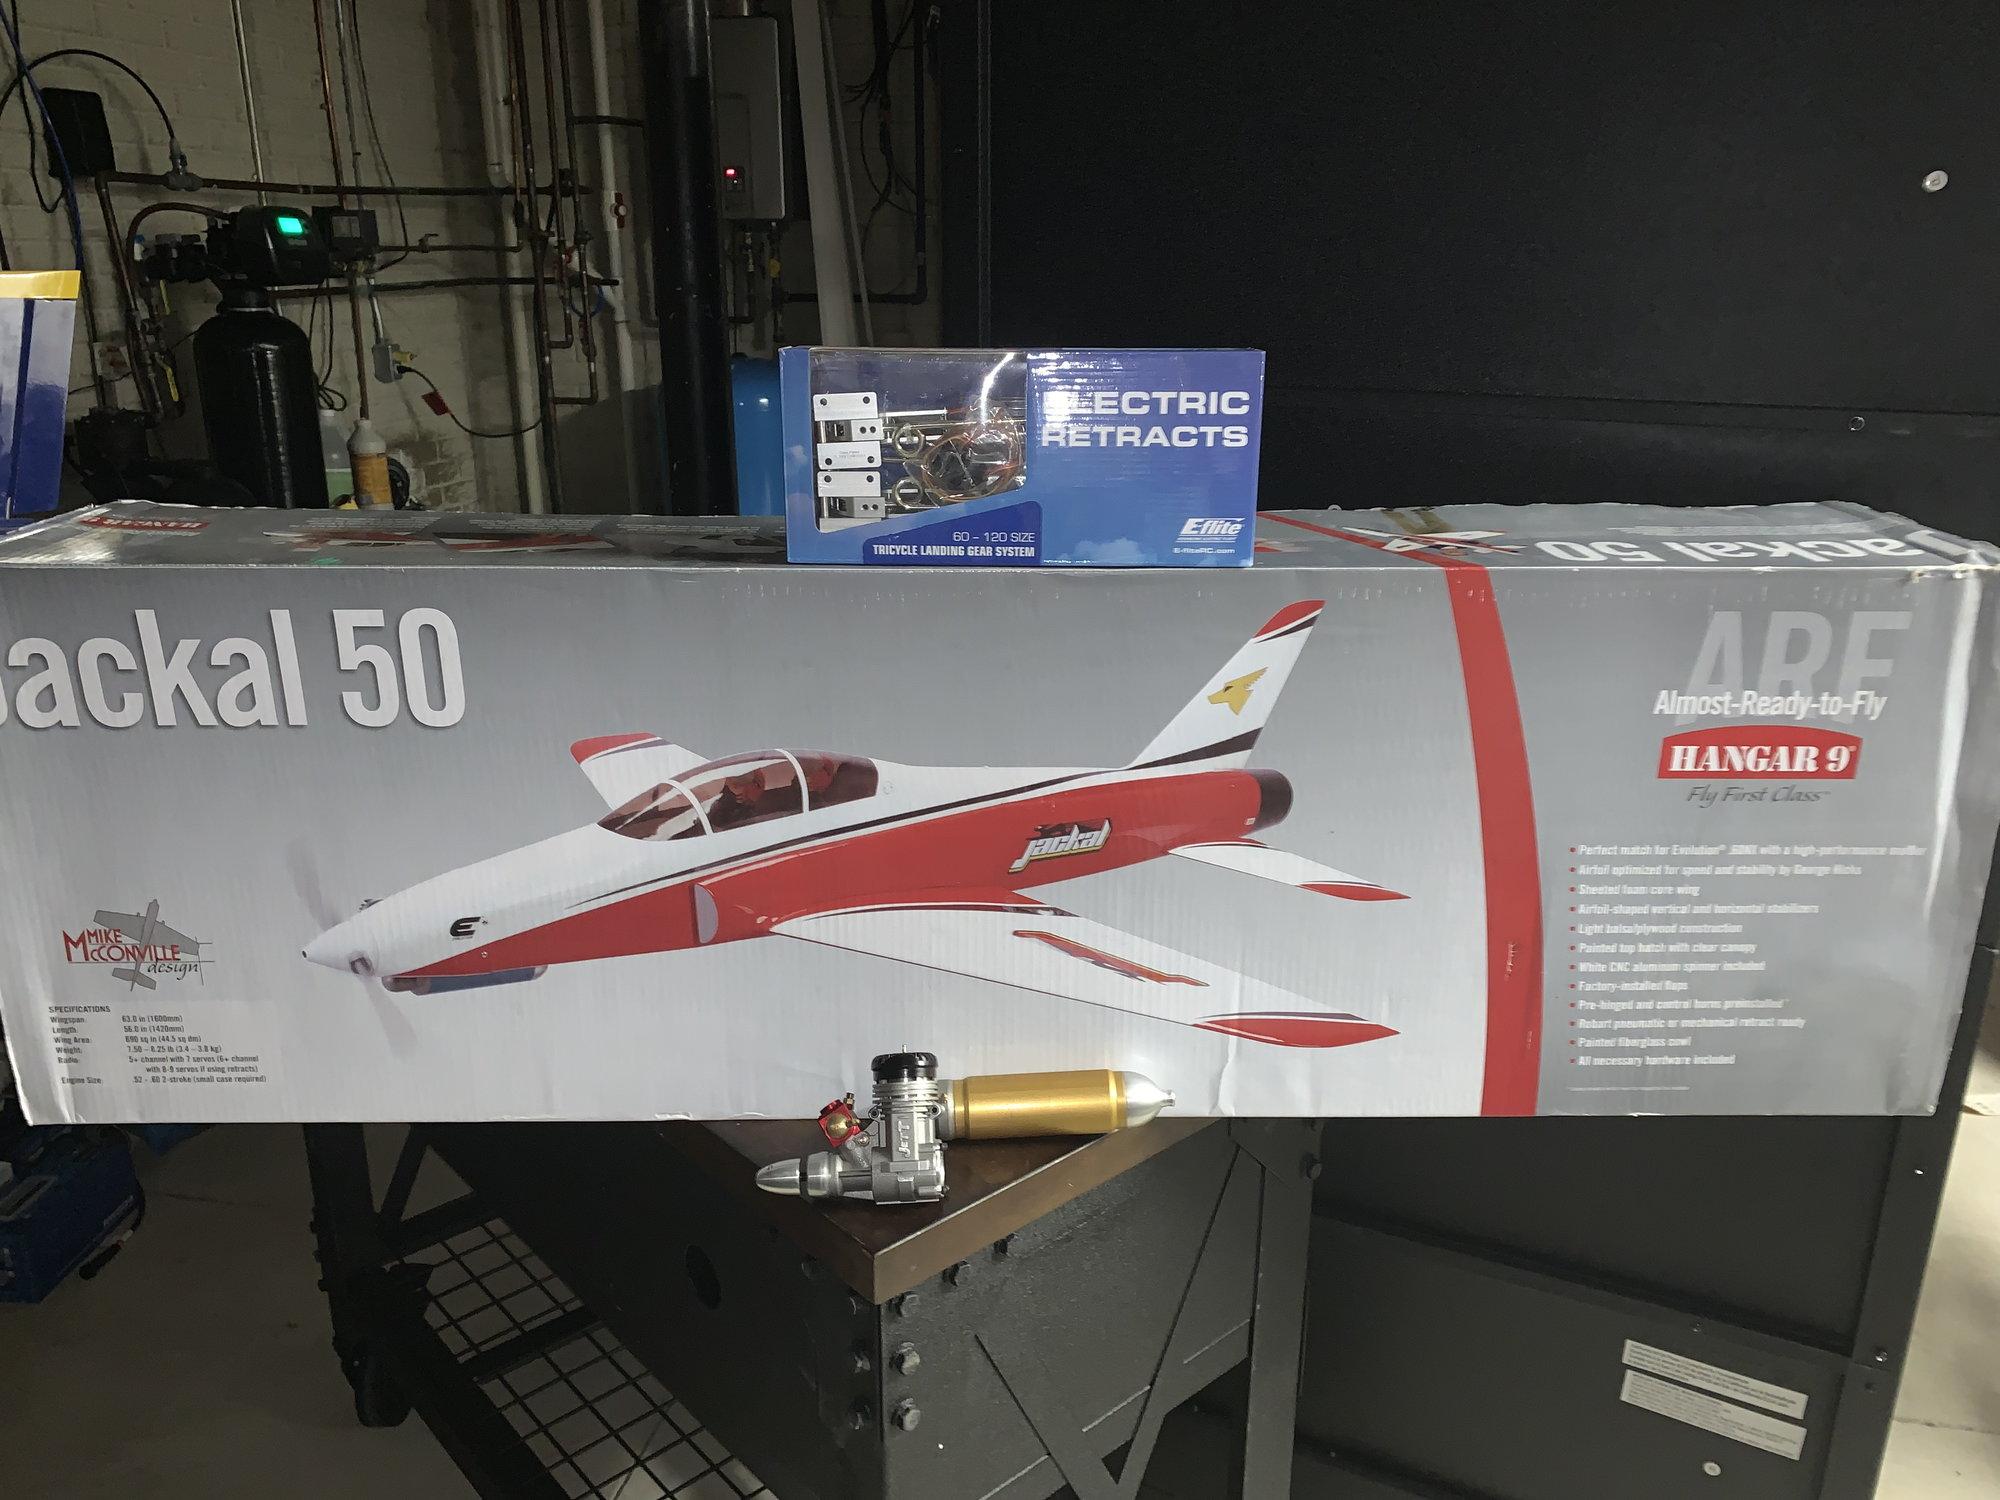 NIB Jackal 50 Package - Jackal ARF, Jett  56 Sport Jett, Eflight